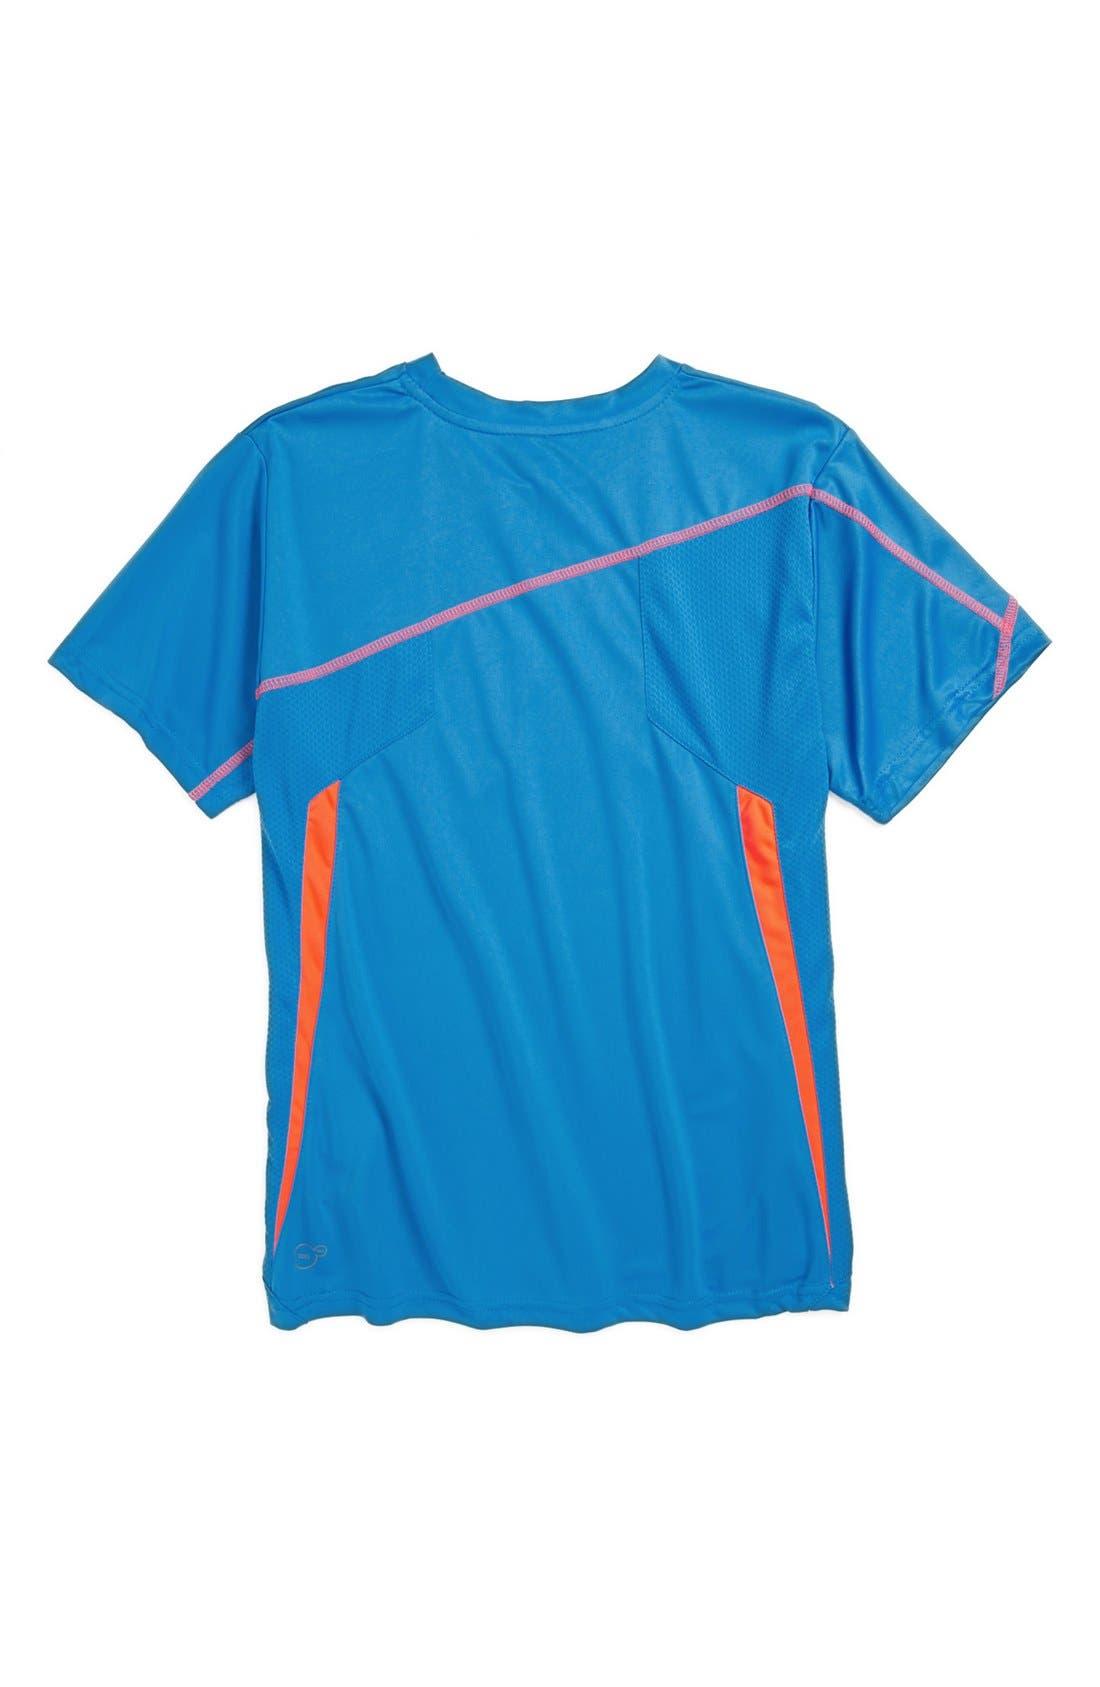 Alternate Image 2  - PUMA 'Formstripe' T-Shirt (Big Boys)